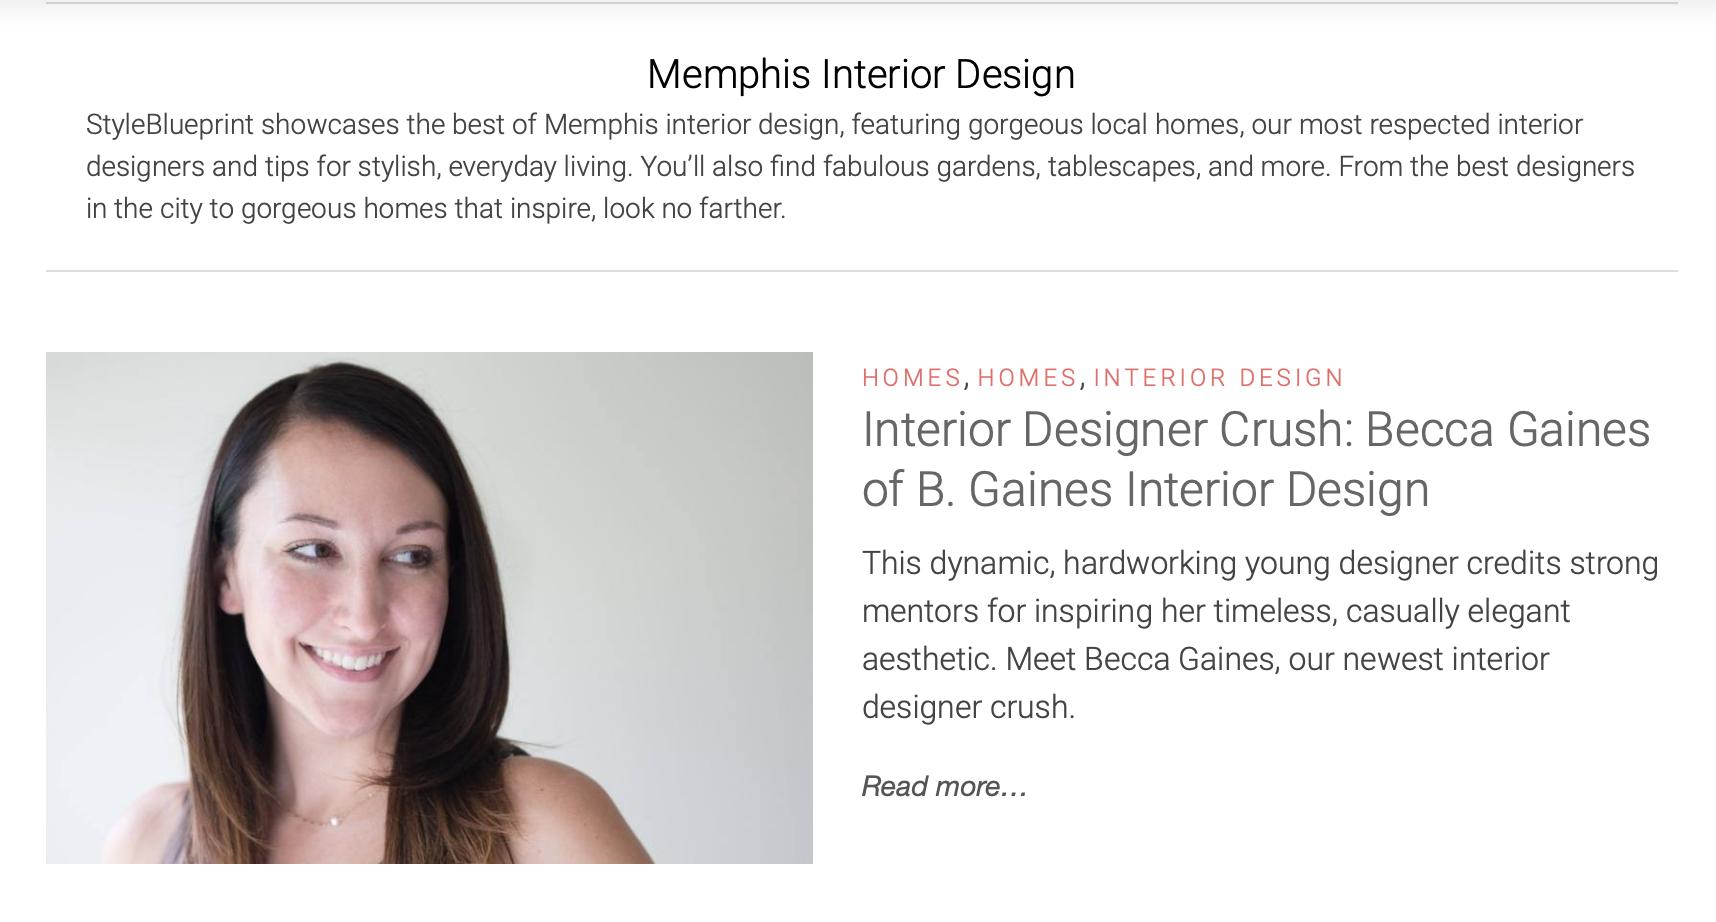 https://styleblueprint.com/memphis/everyday/interior-designer-crush-becca-gaines/